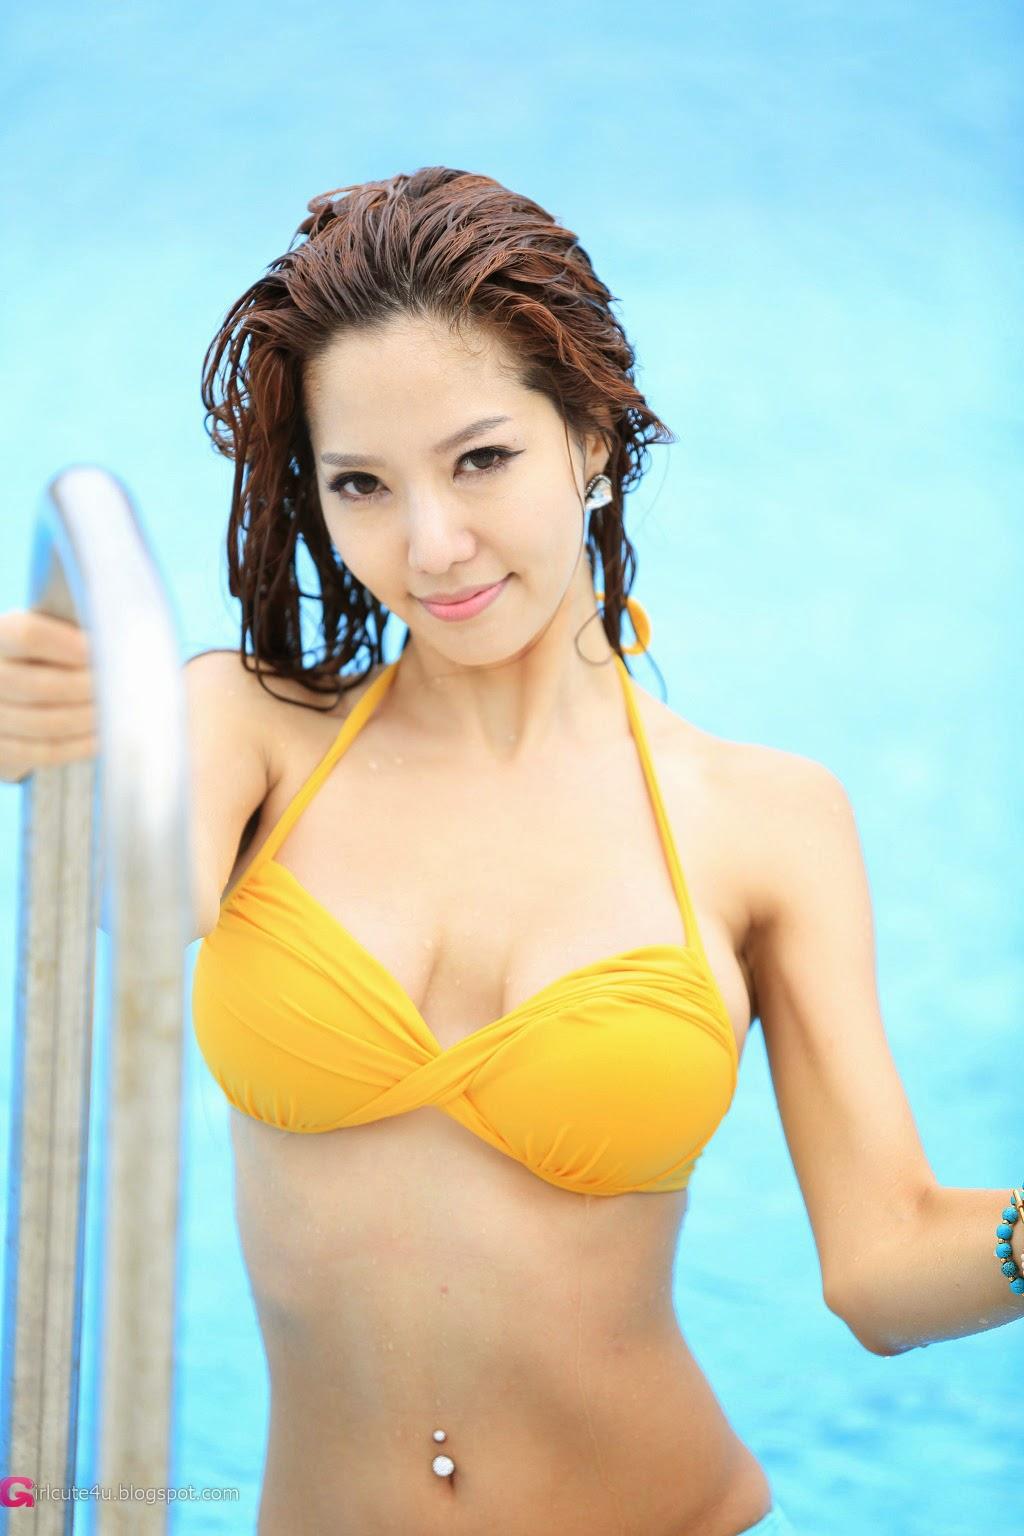 6 Han Min Young - Summer - very cute asian girl-girlcute4u.blogspot.com